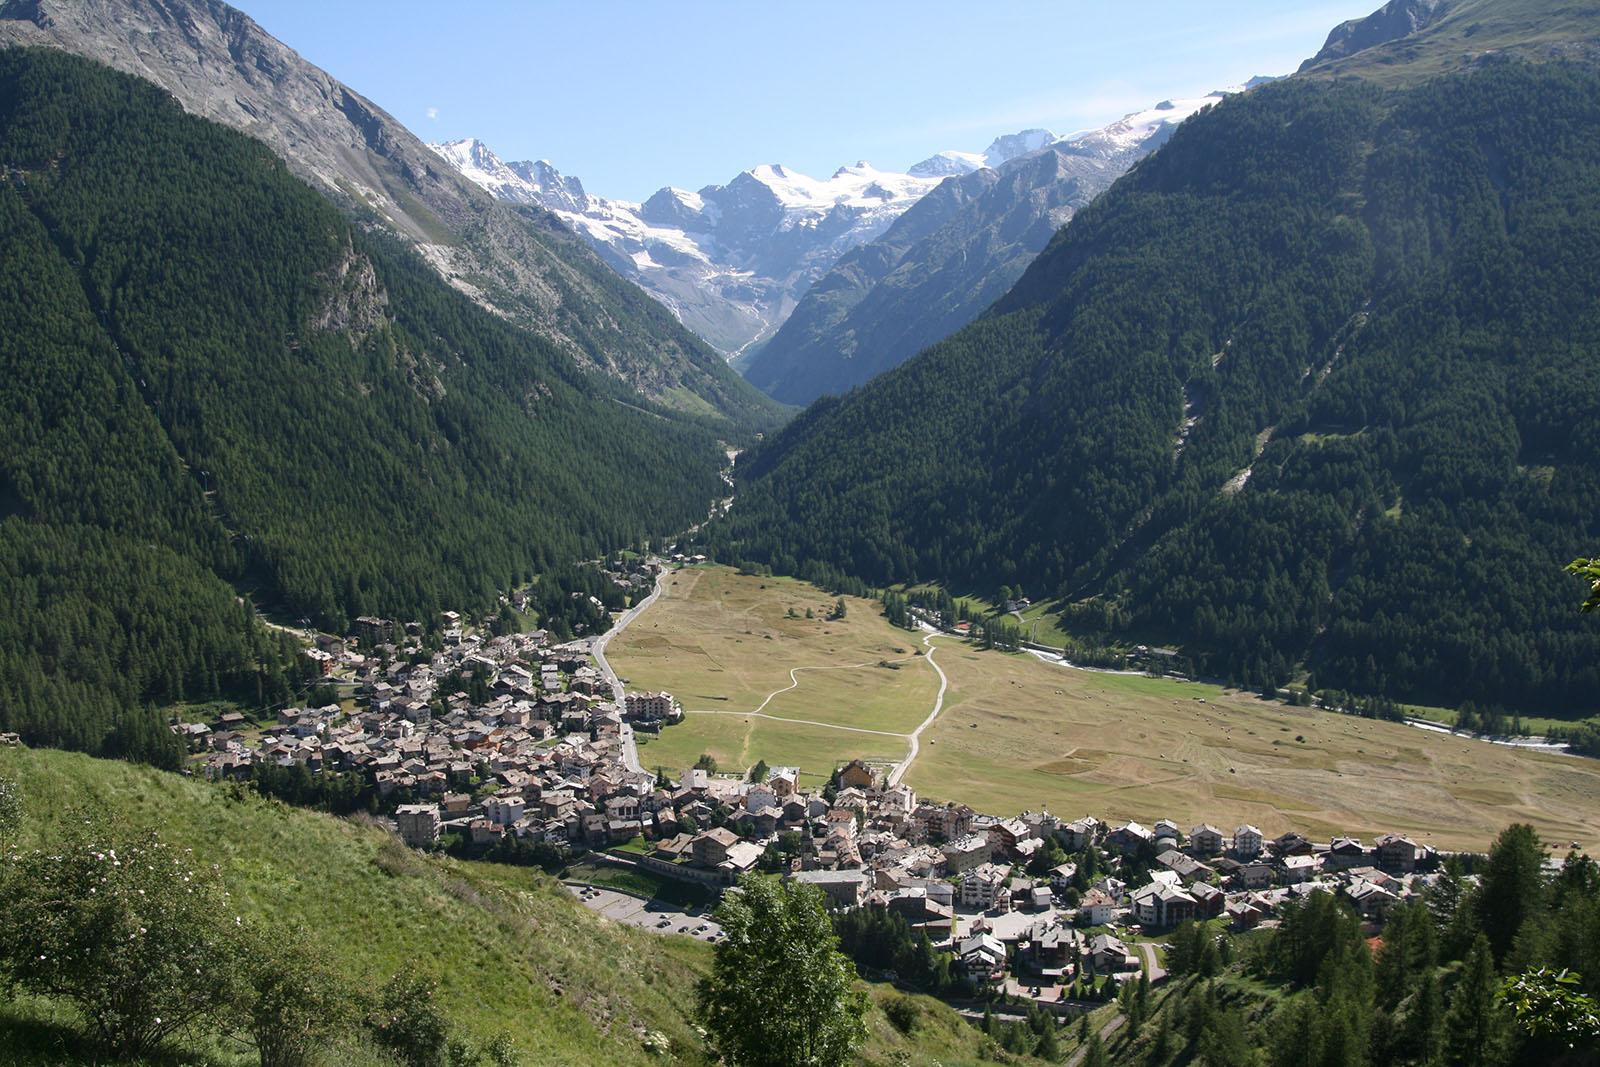 Vacances en montagne - Vacances en montagne locati architectes ...